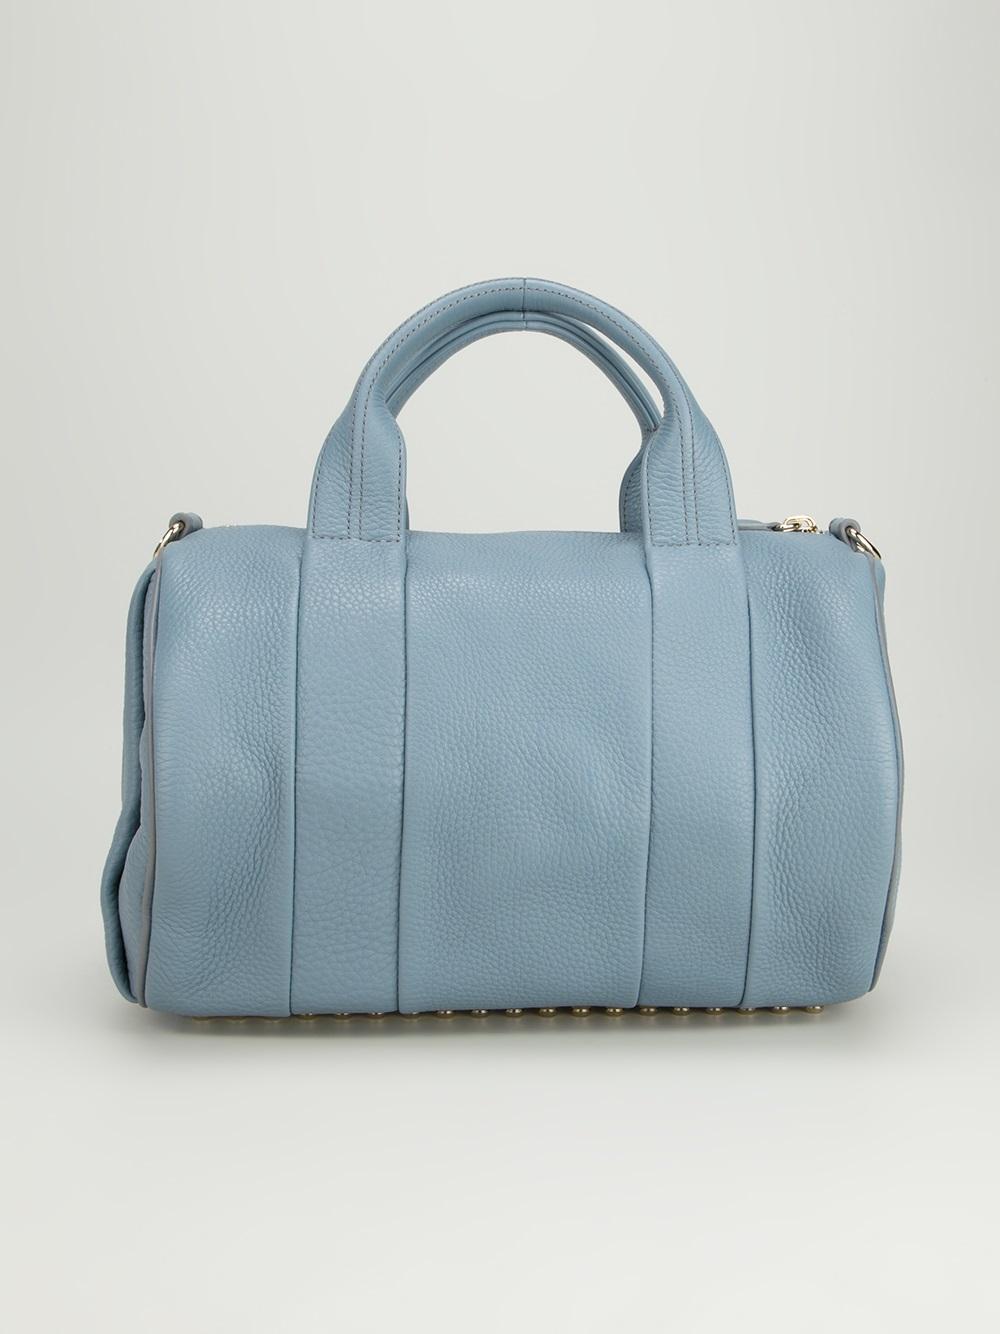 alexander wang rocco bag in blue lyst. Black Bedroom Furniture Sets. Home Design Ideas